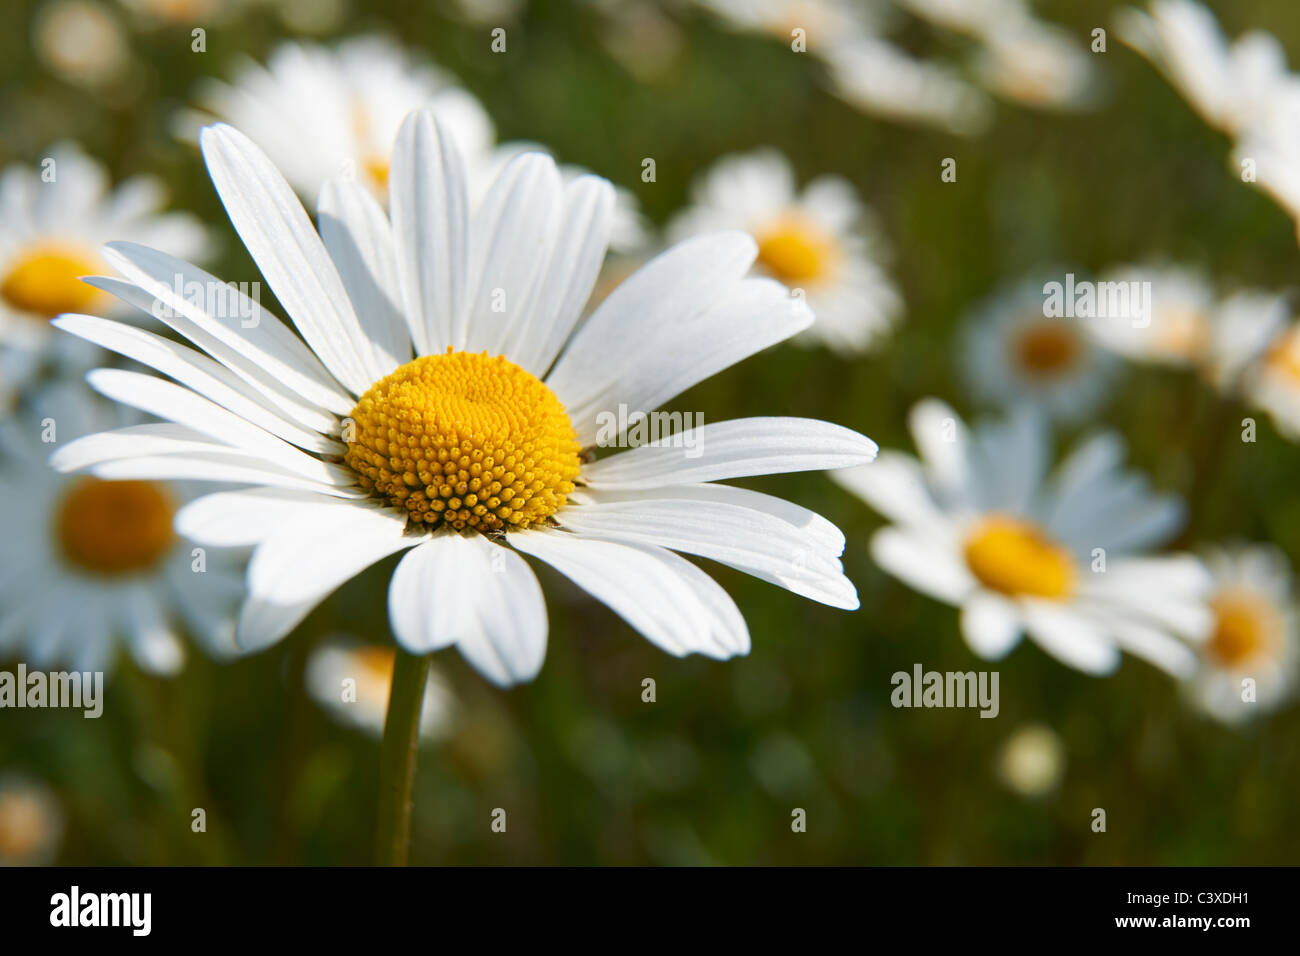 Nahaufnahme von Daisy im Feld in voller Blüte Stockbild